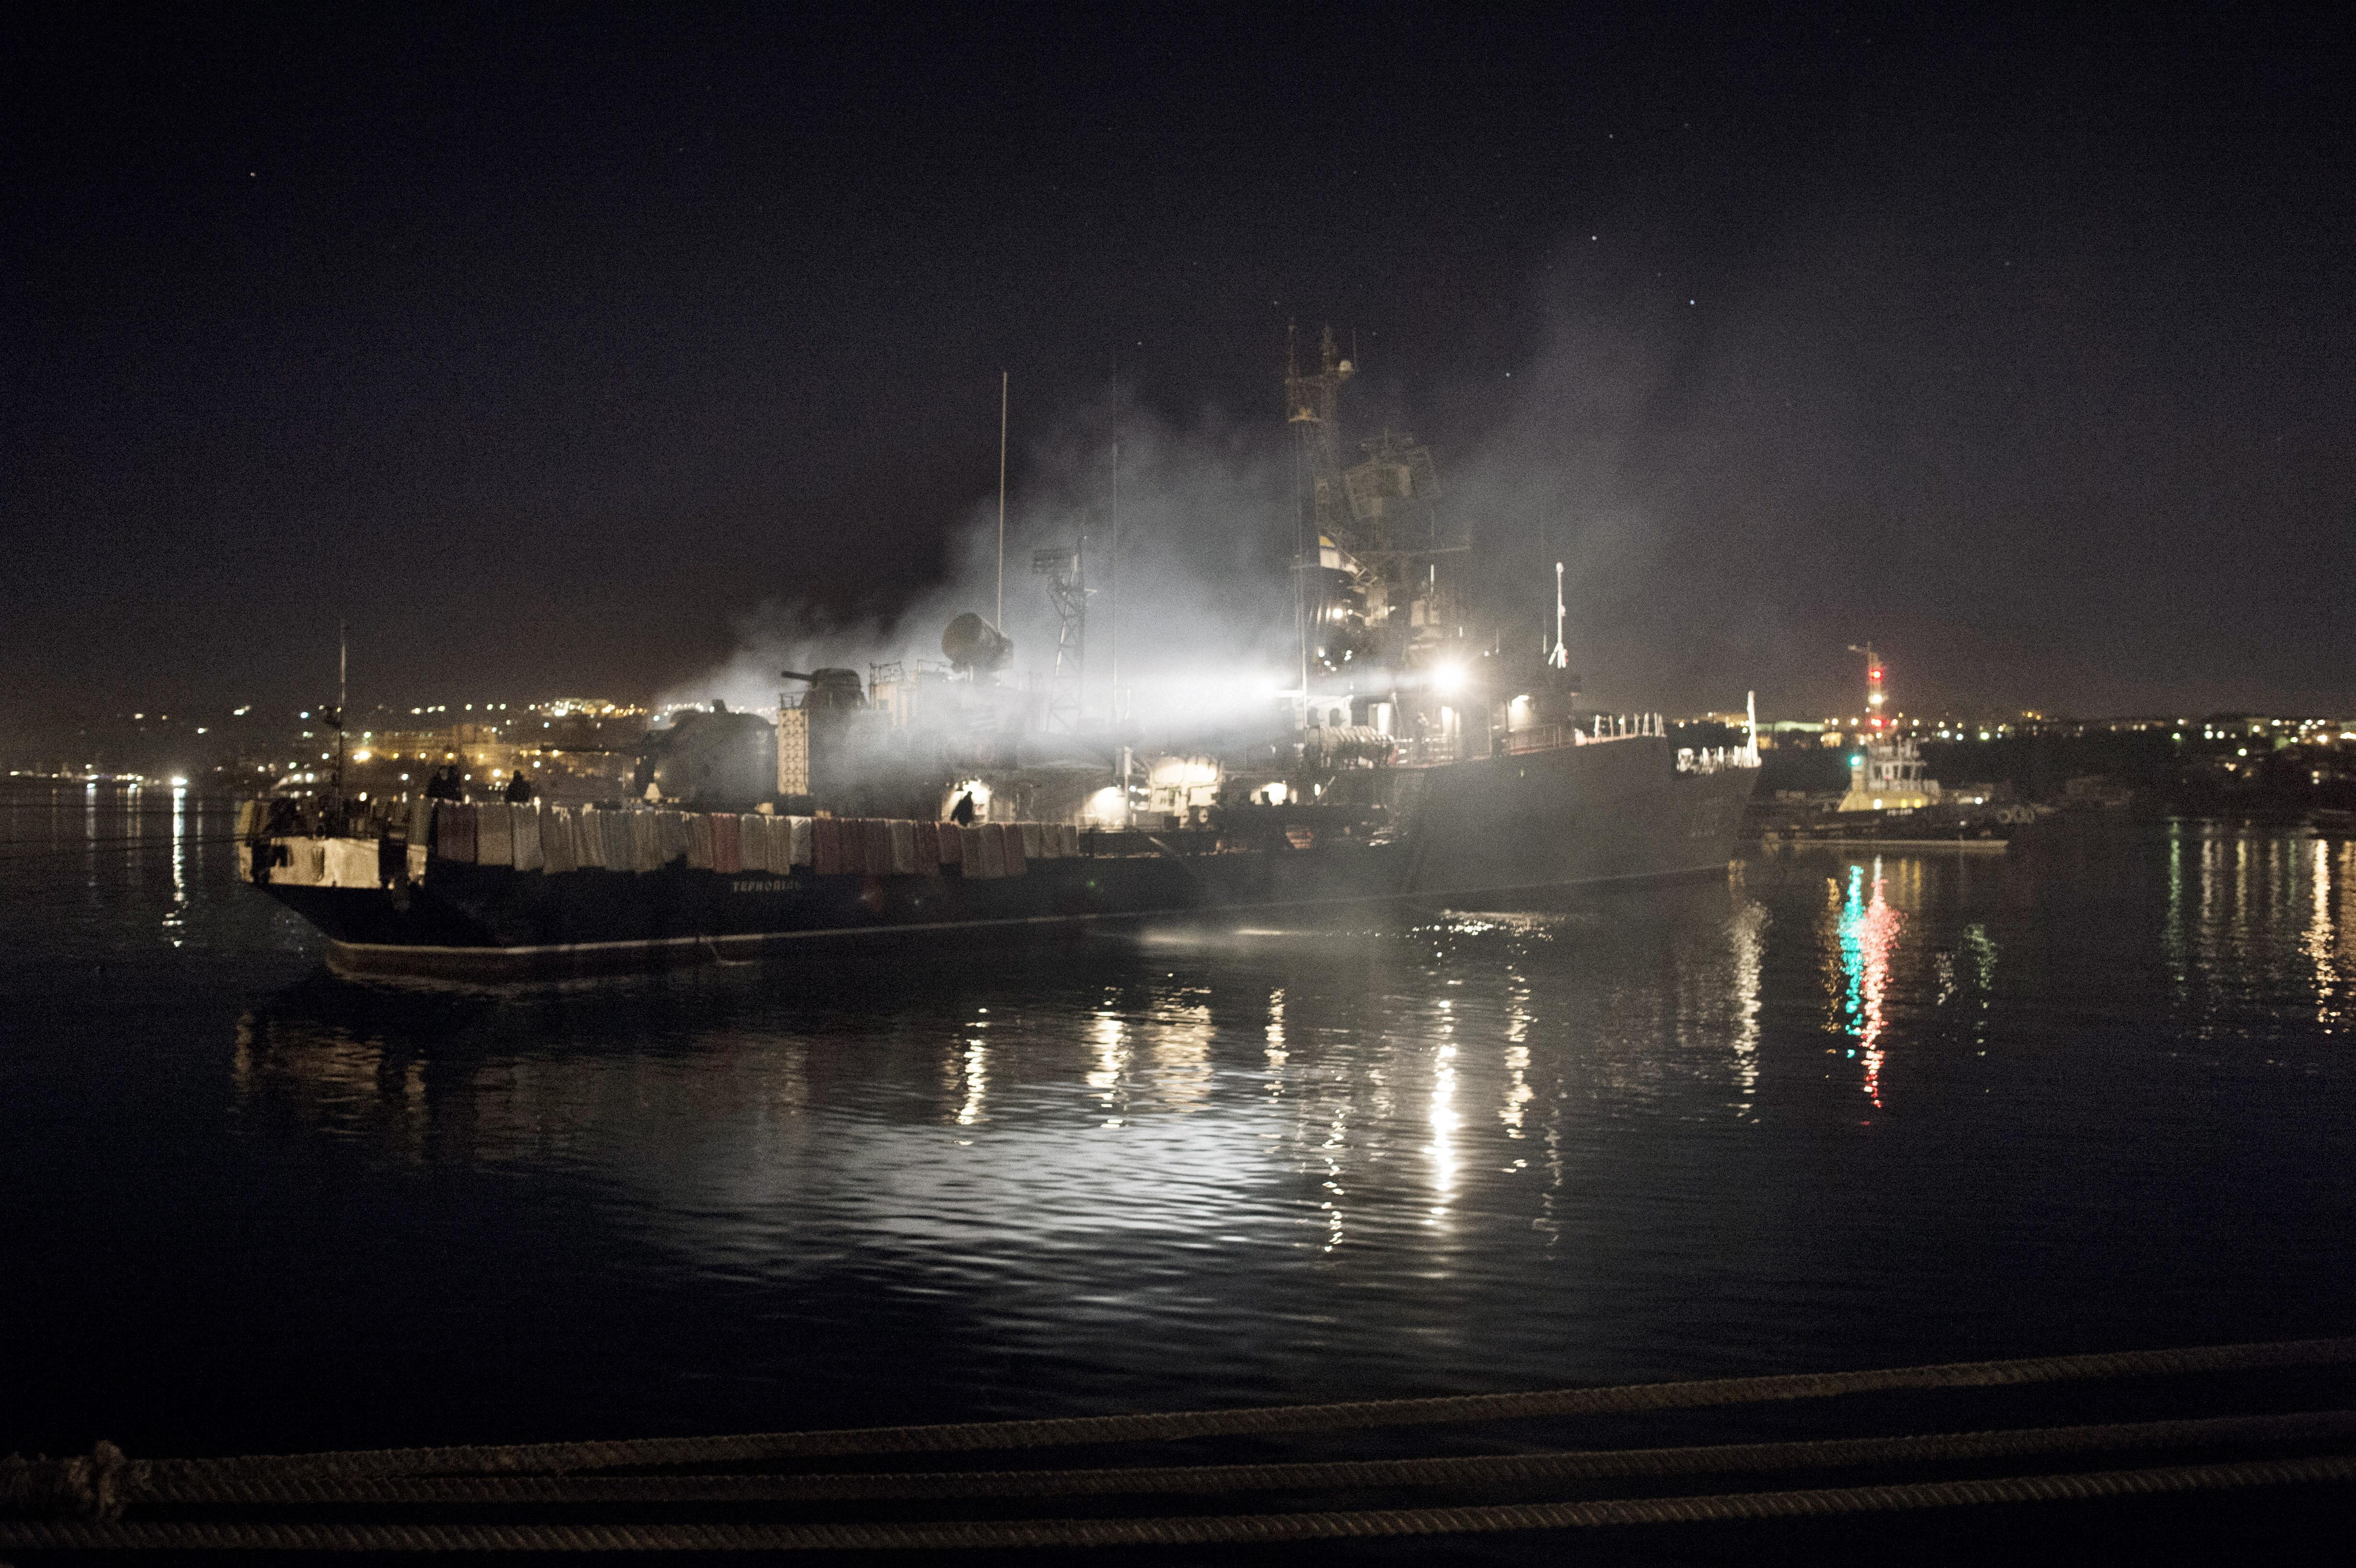 Sailors  stand on board the Ukrainian navy corvette Ternopil at harbor of Sevastopol, March 3, 2014.